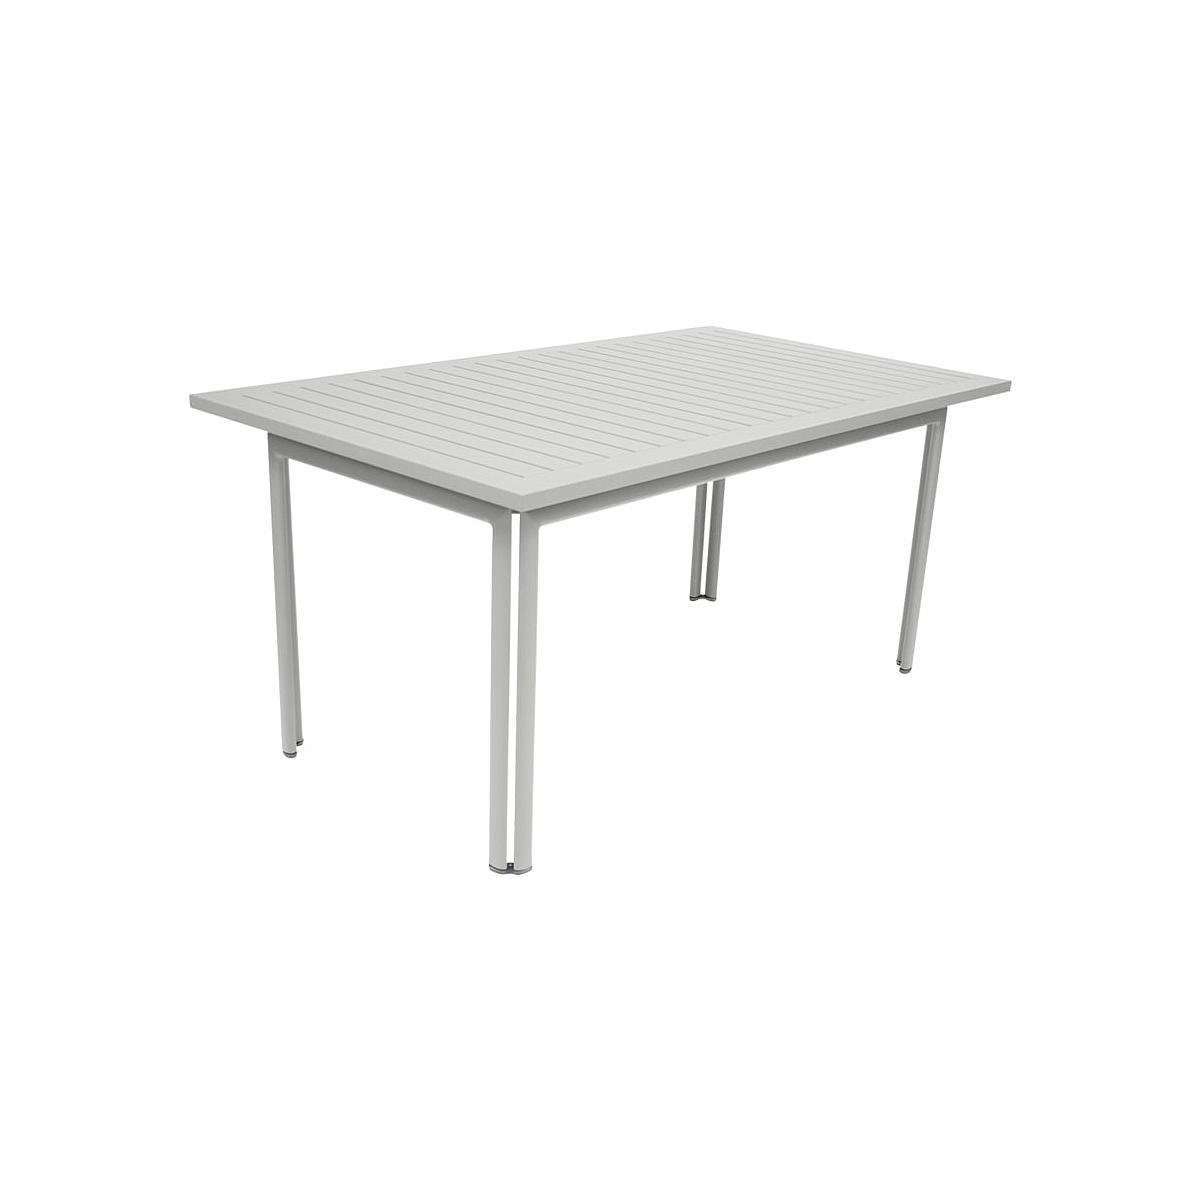 Table de jardin COSTA FERMOB 160x80cm Gris métal